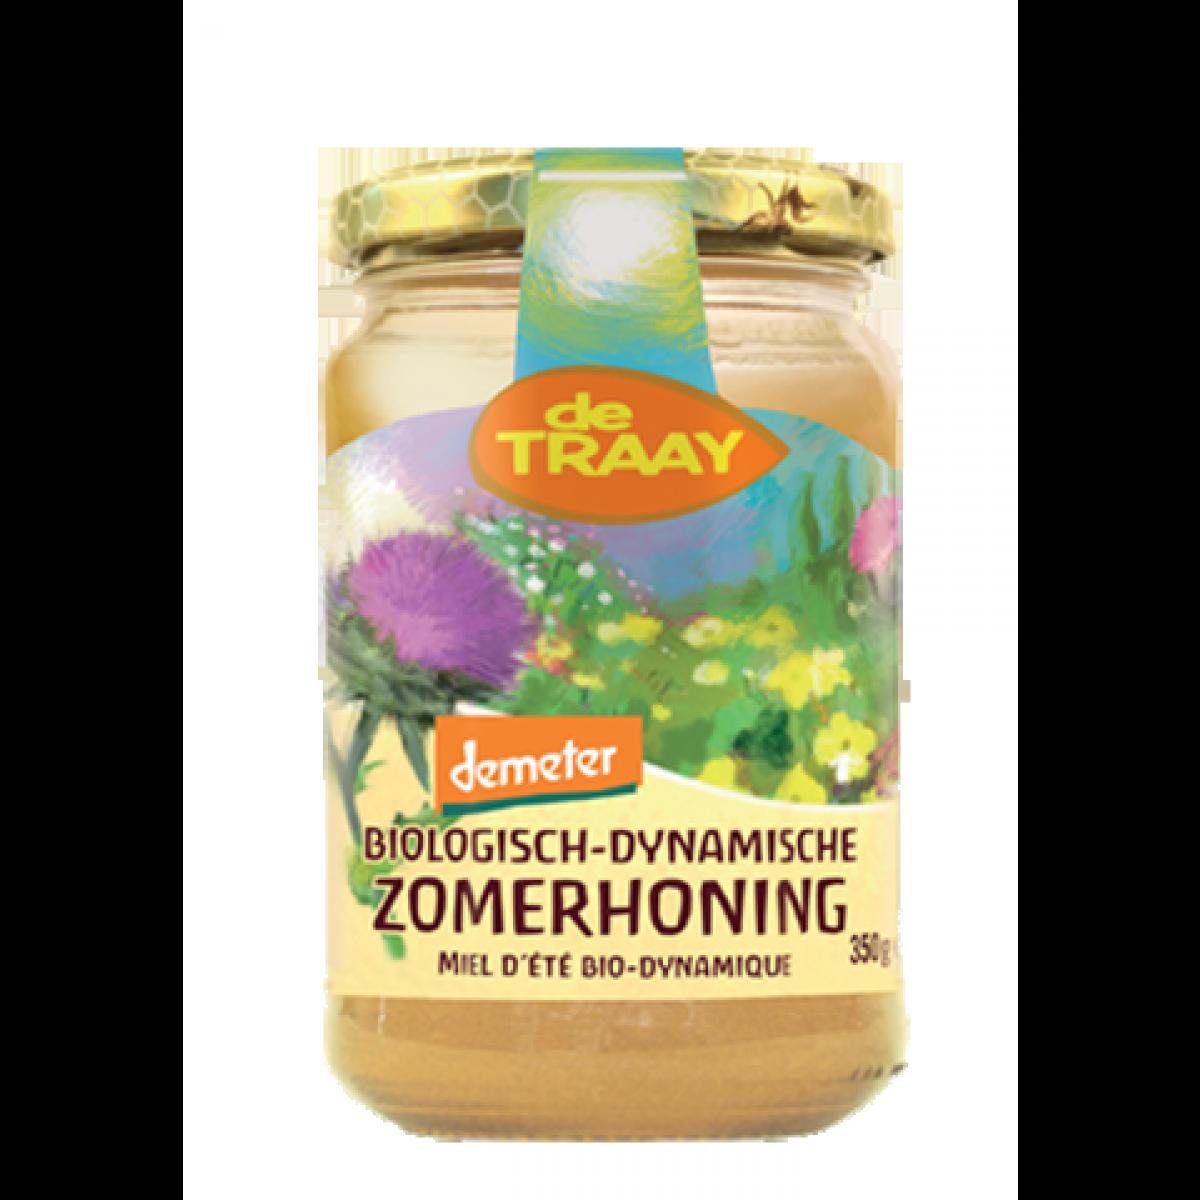 Biologische-Dynamische Bloemhoning Crème - Zomerhoning